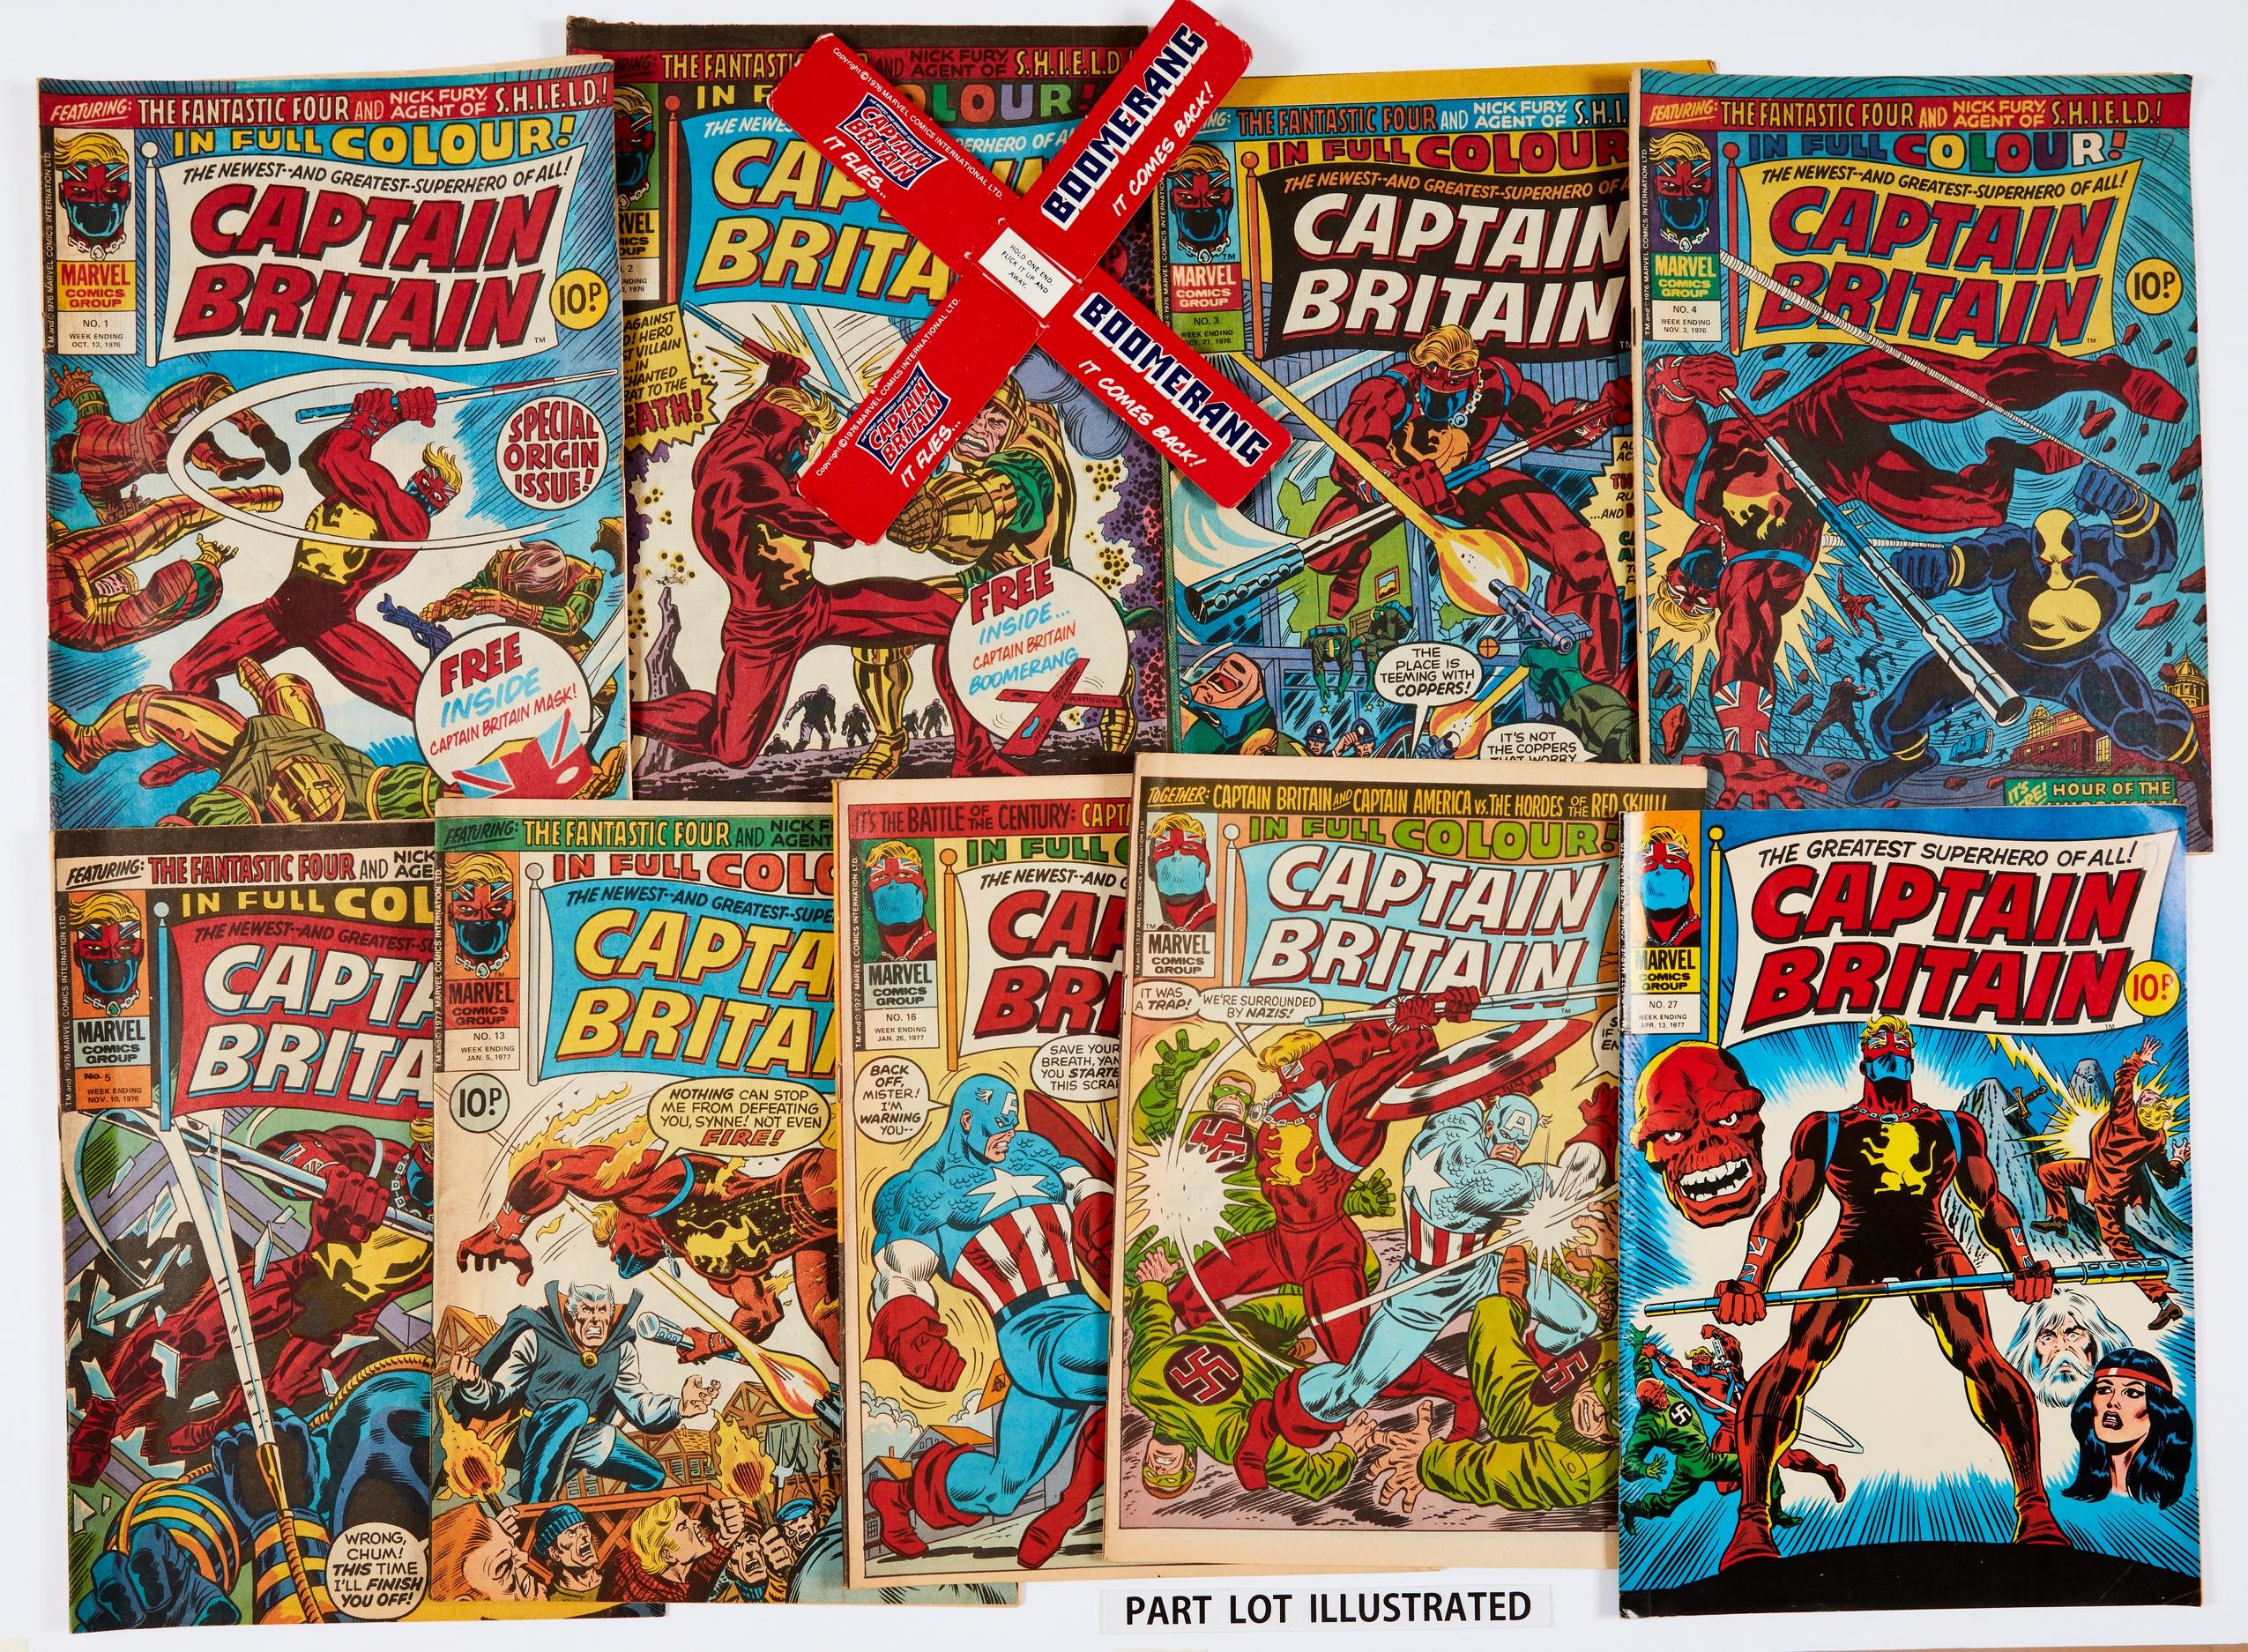 Captain Britain (1976-77) 1-22, 25-28. No 2 wfg Captain Britain Boomerang. No 1 Fun Page Maze